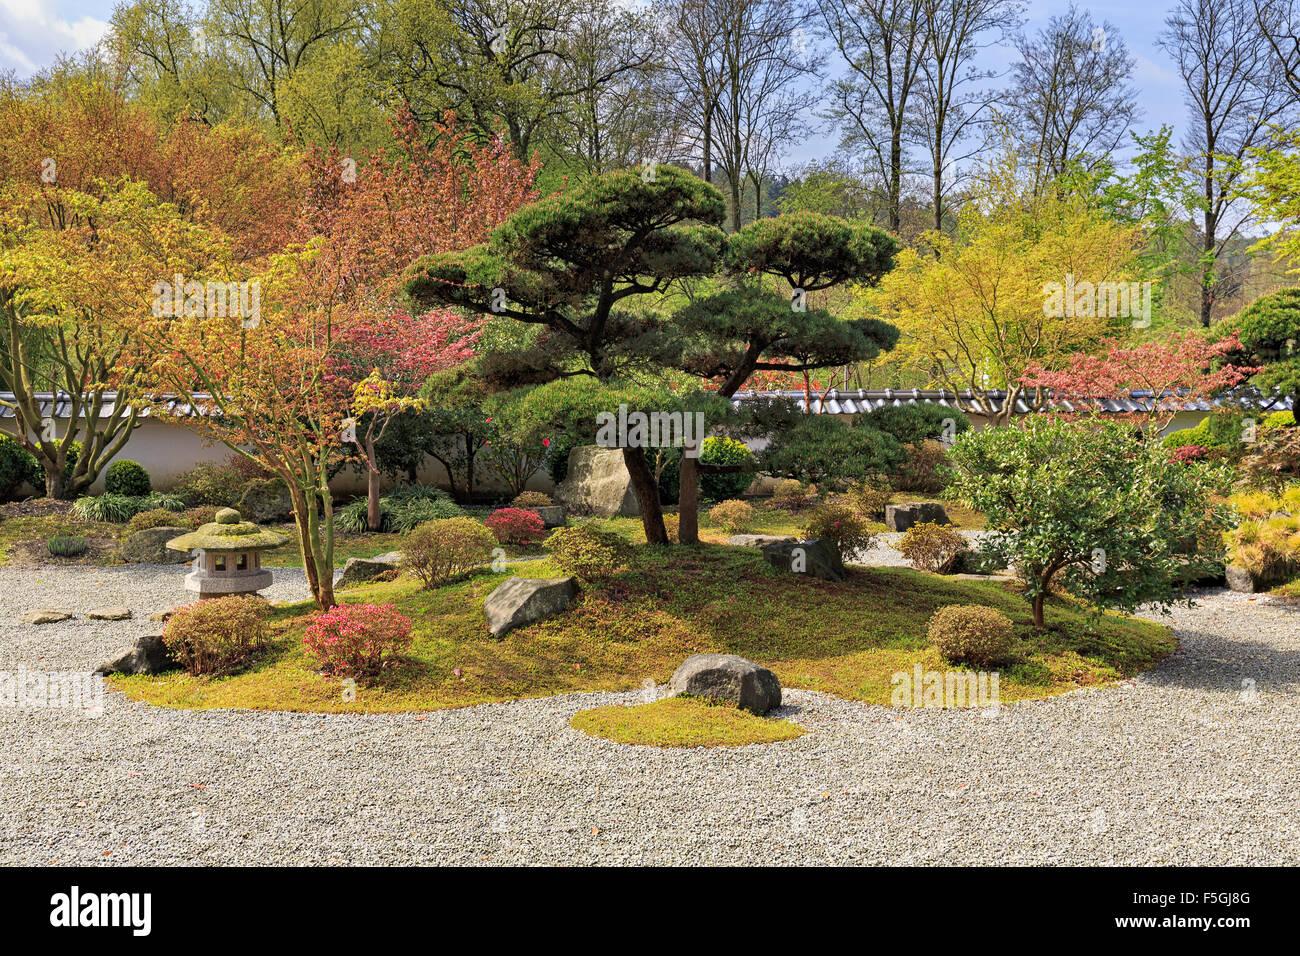 jardin japonais au printemps kare san sui jardin zen. Black Bedroom Furniture Sets. Home Design Ideas